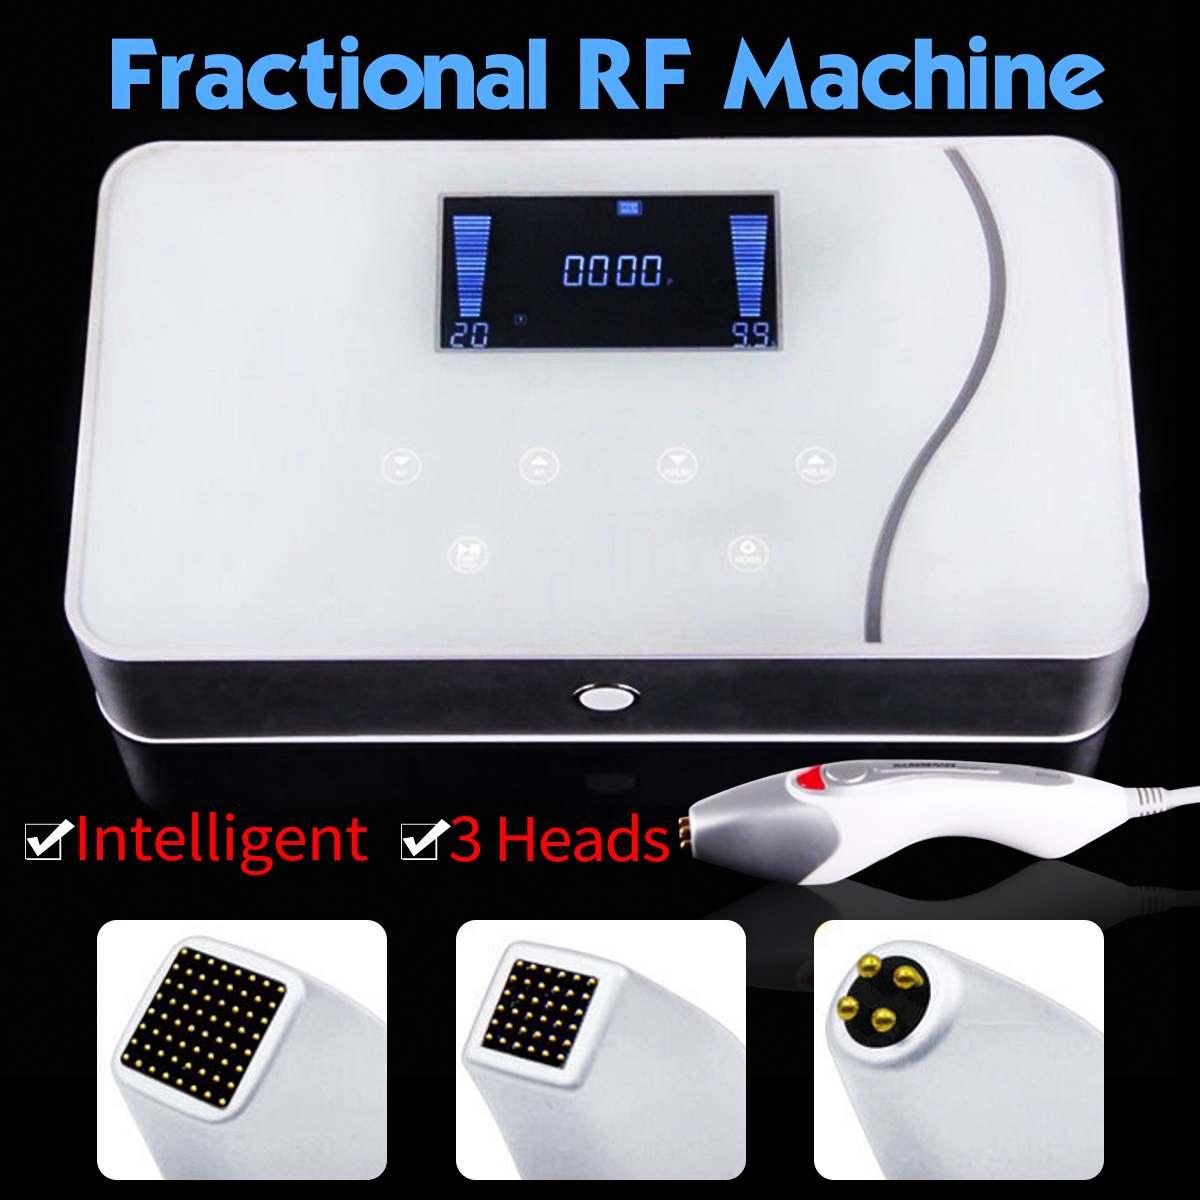 100-220V Intelligent Fractional RF Machine Face Lift Skin Tightening Wrinkle Removal Dot Matrixs RF Beauty Device Machine